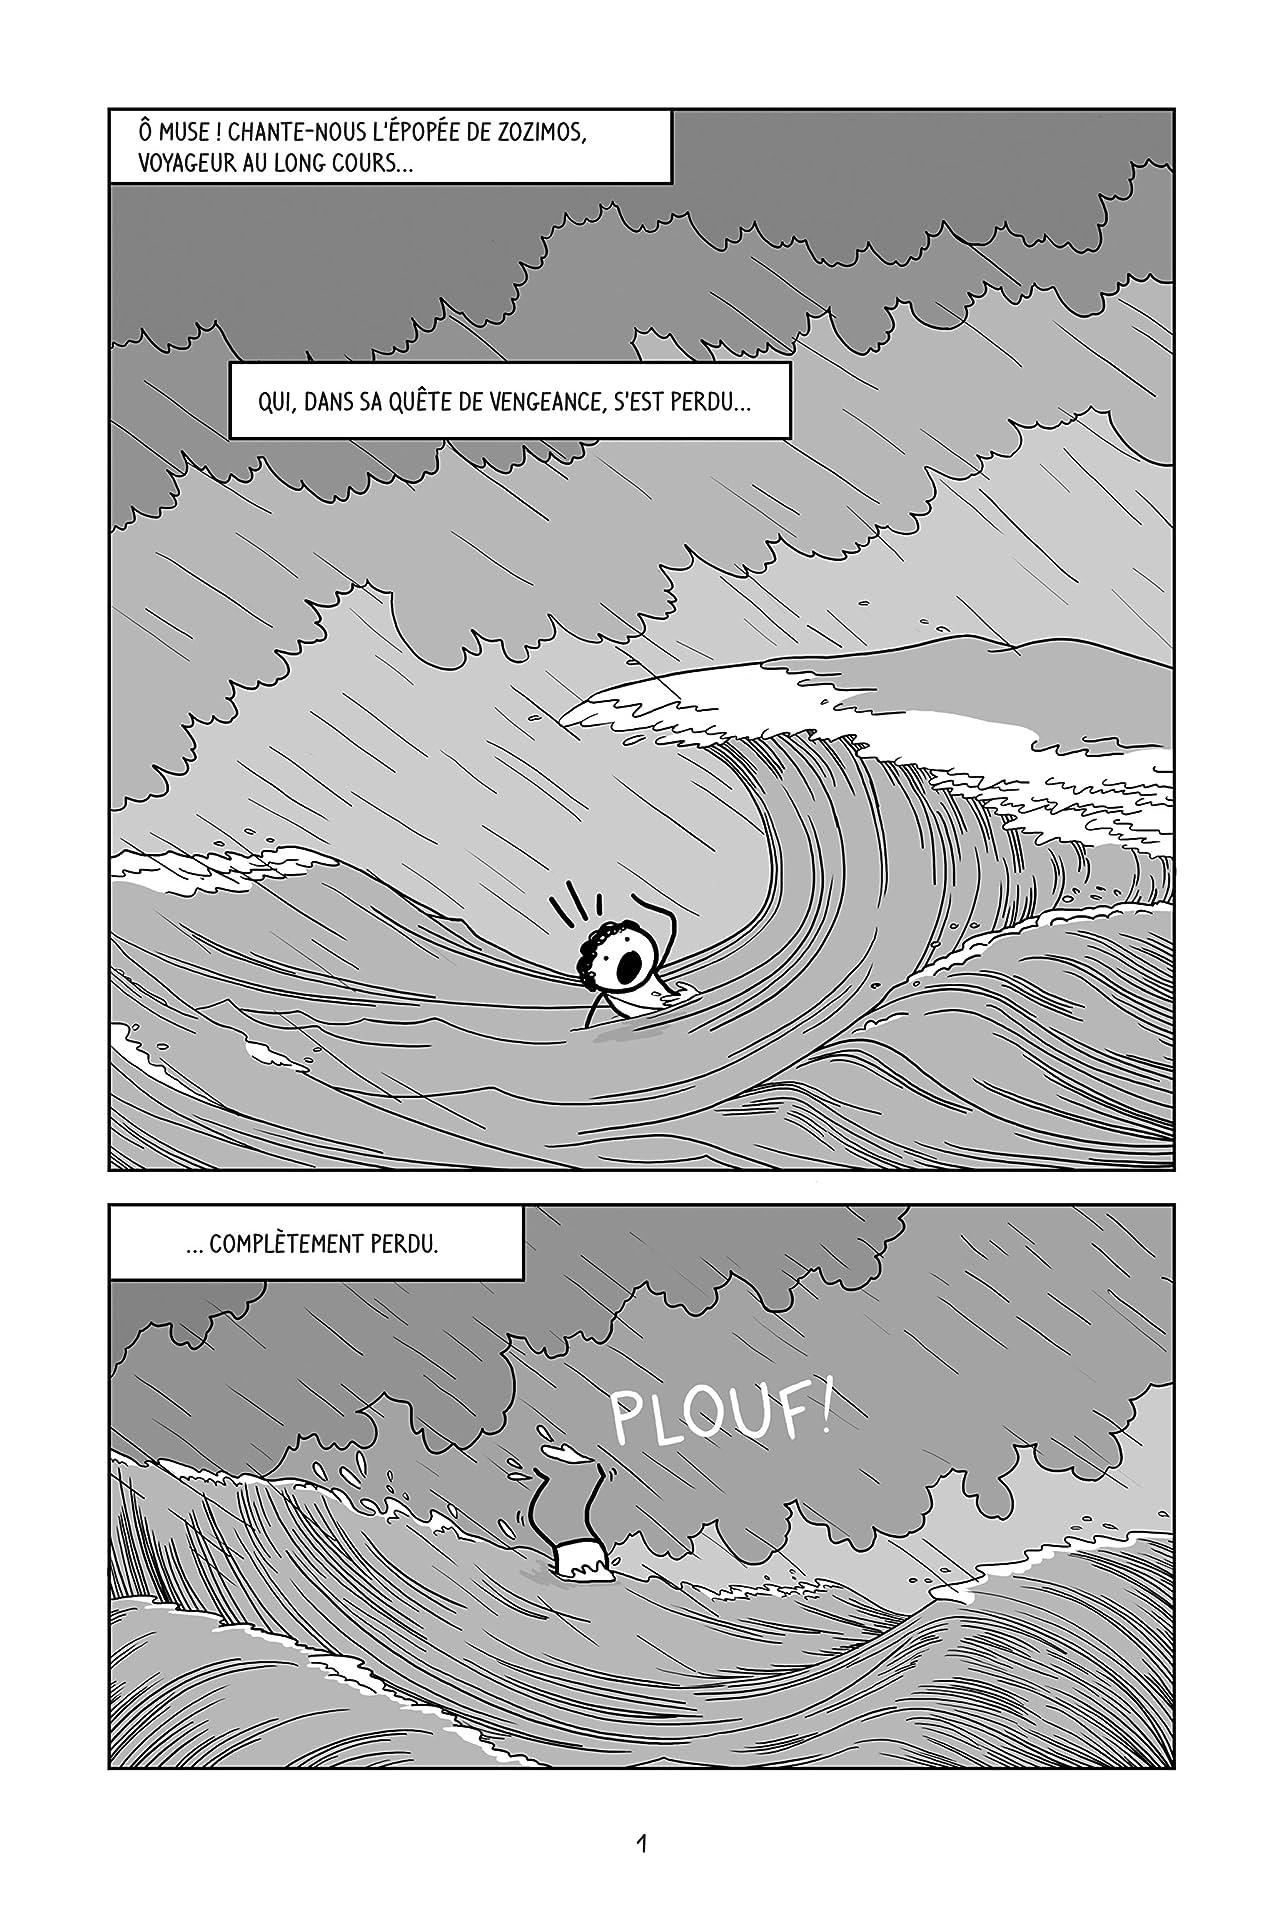 L'Odyssée de Zozimos Vol. 1